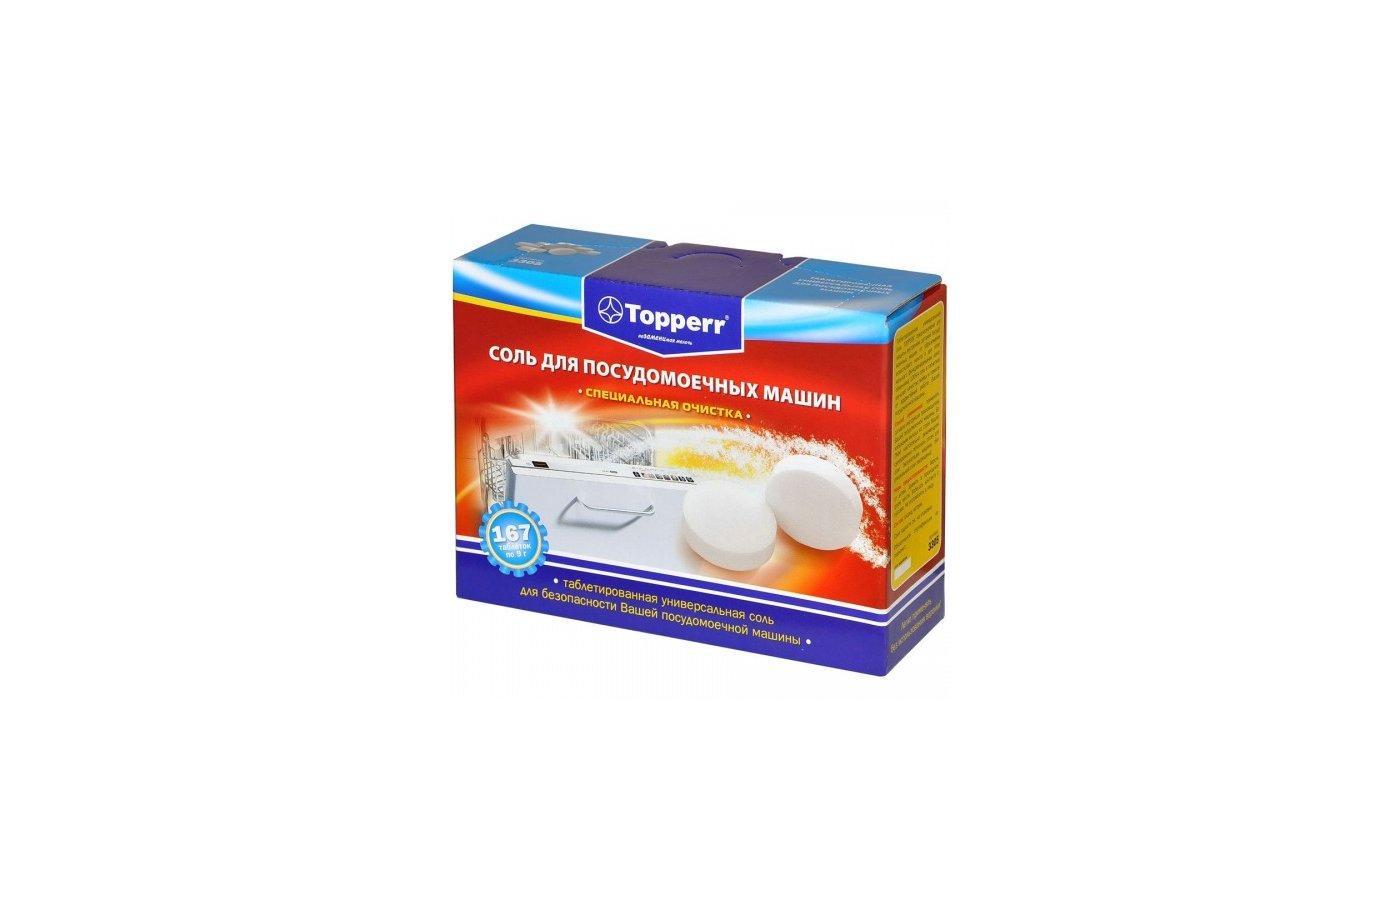 Соль для ПММ TOPPERR 3305 Соль для ПММ таблетированная 1.5кг